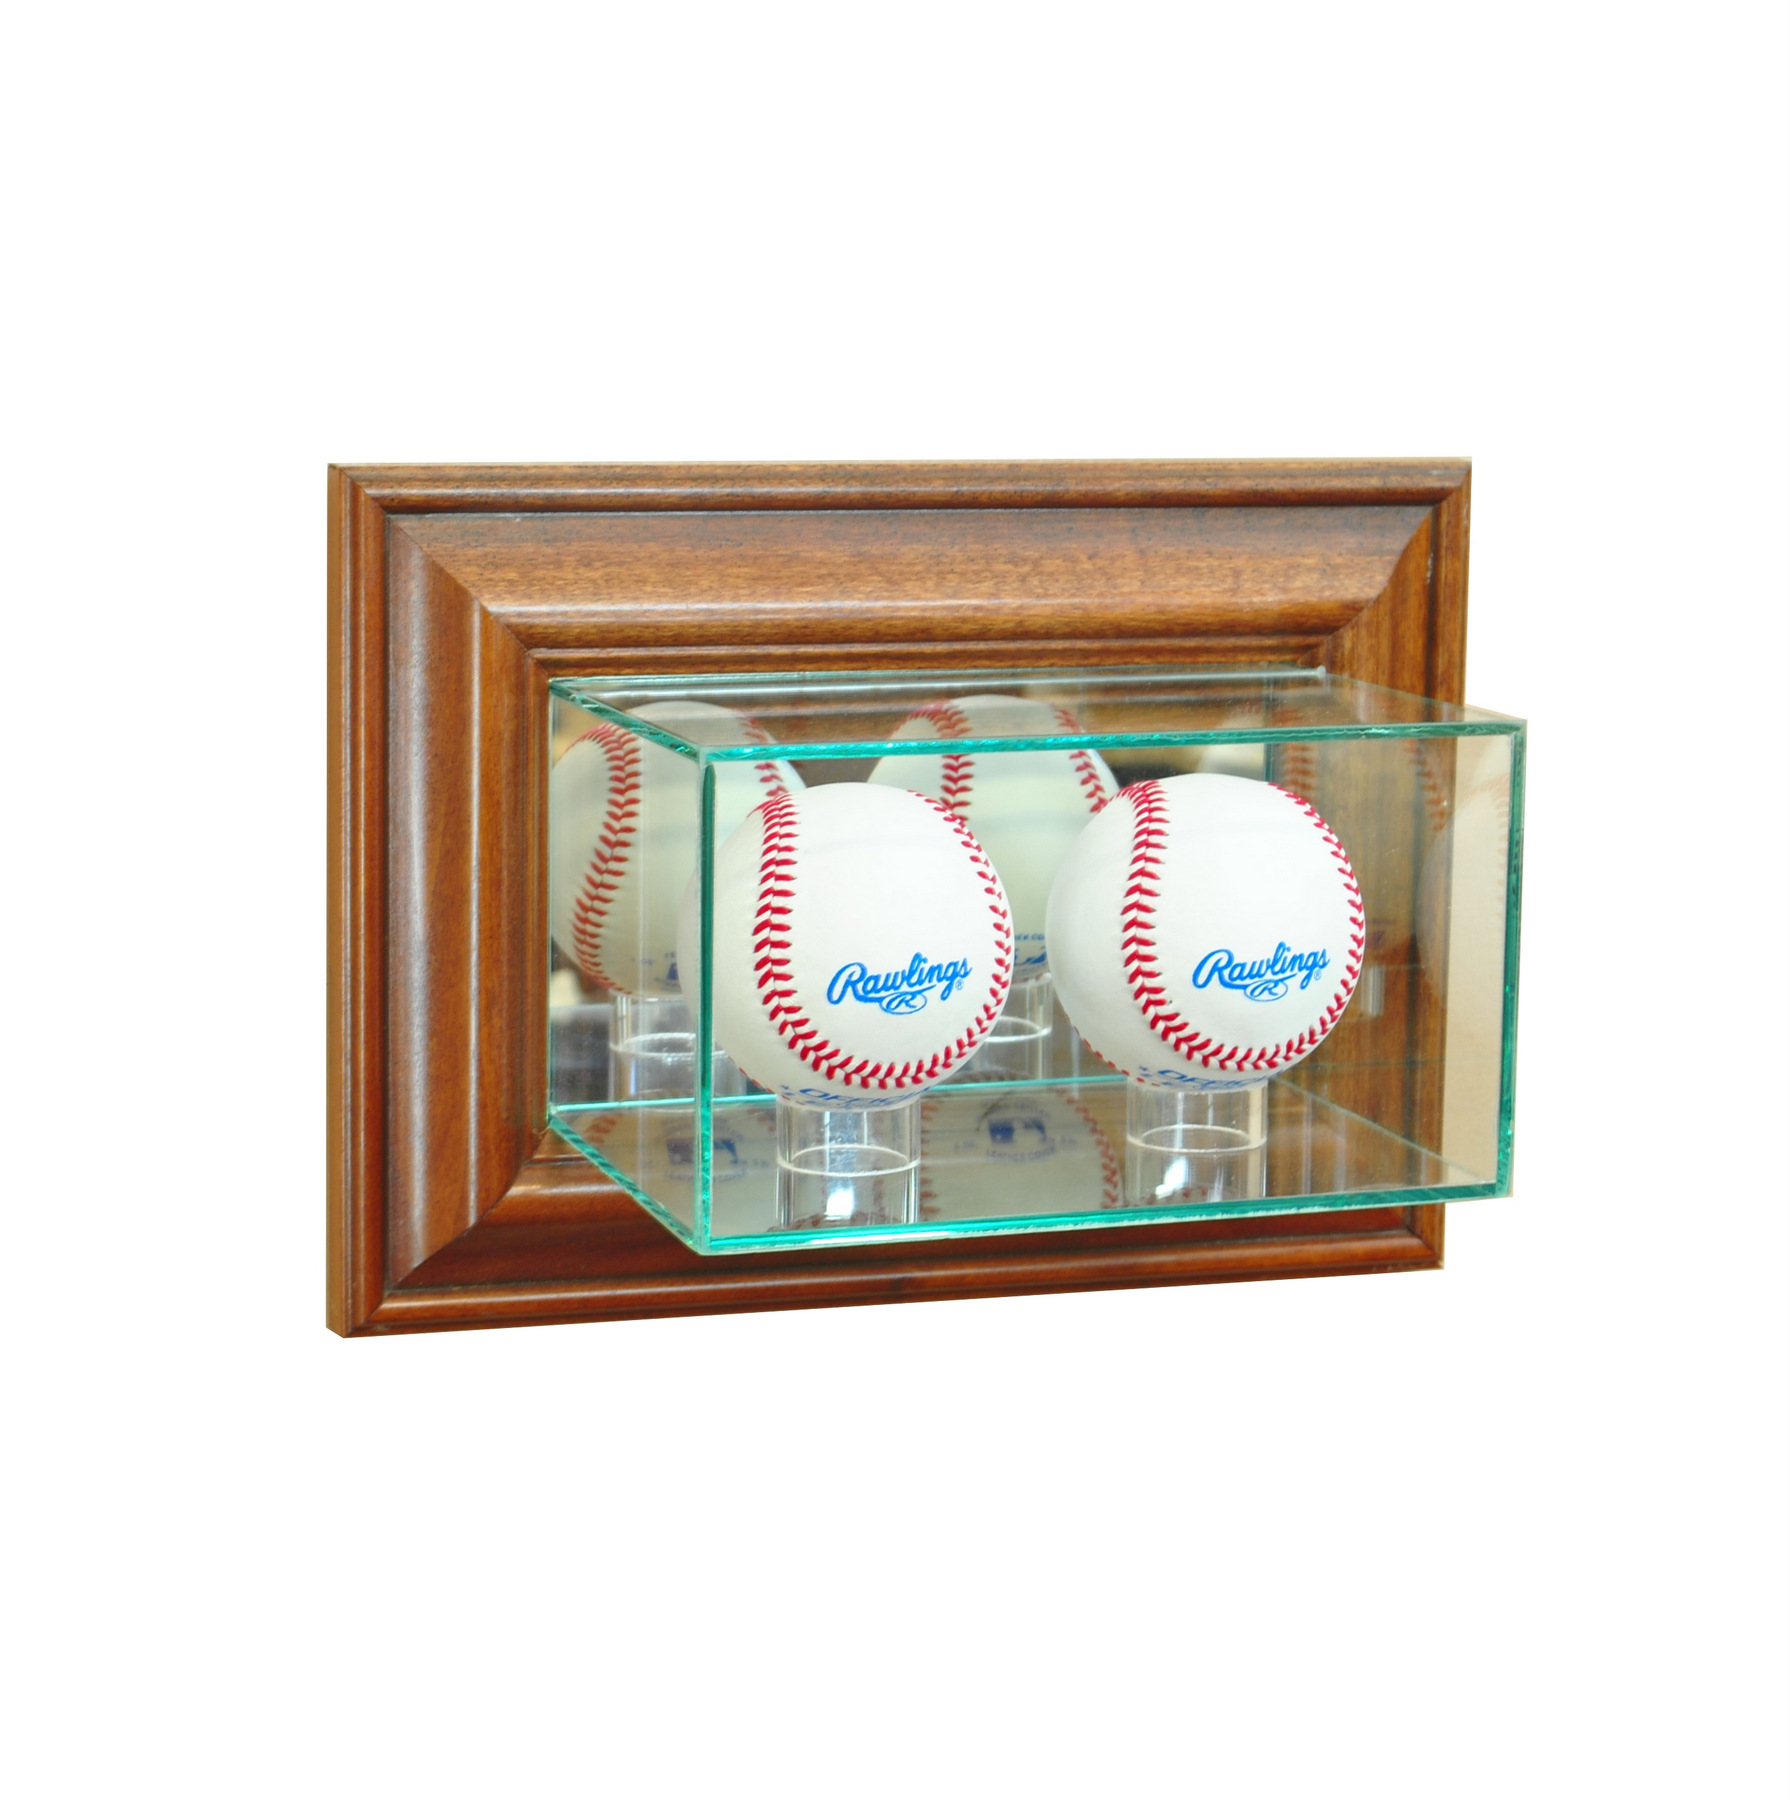 wall mount glass double baseball display case uv protection walnut wood mirror ebay. Black Bedroom Furniture Sets. Home Design Ideas